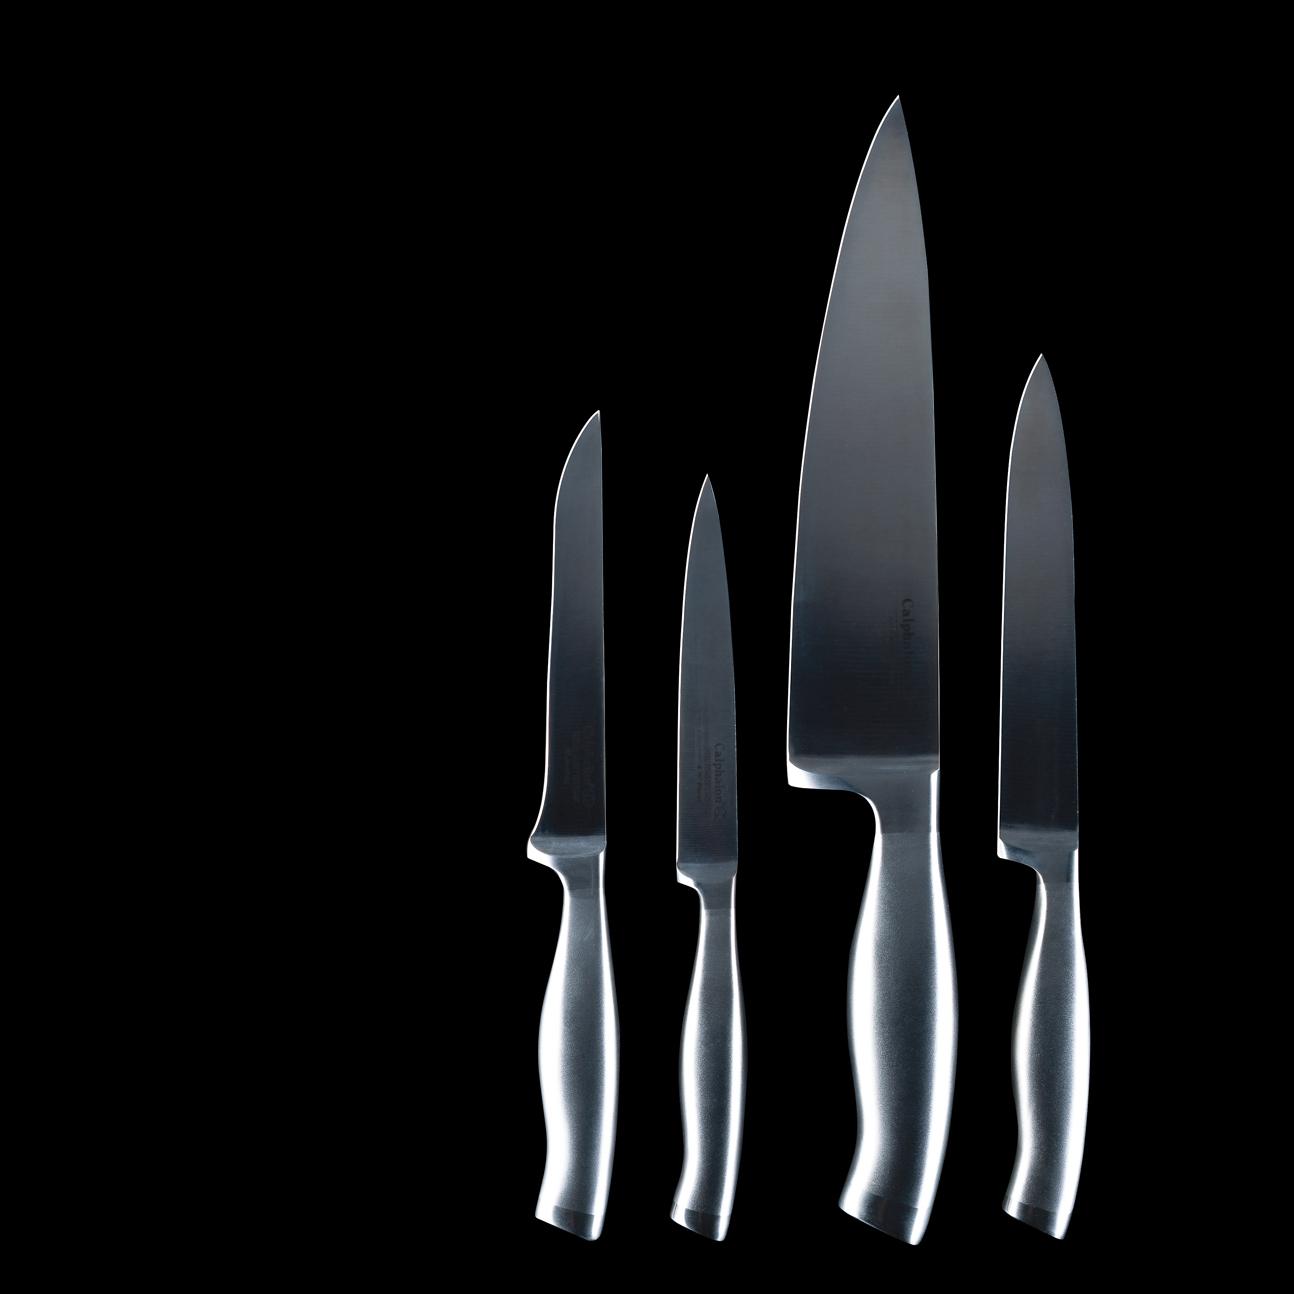 homecooking knives